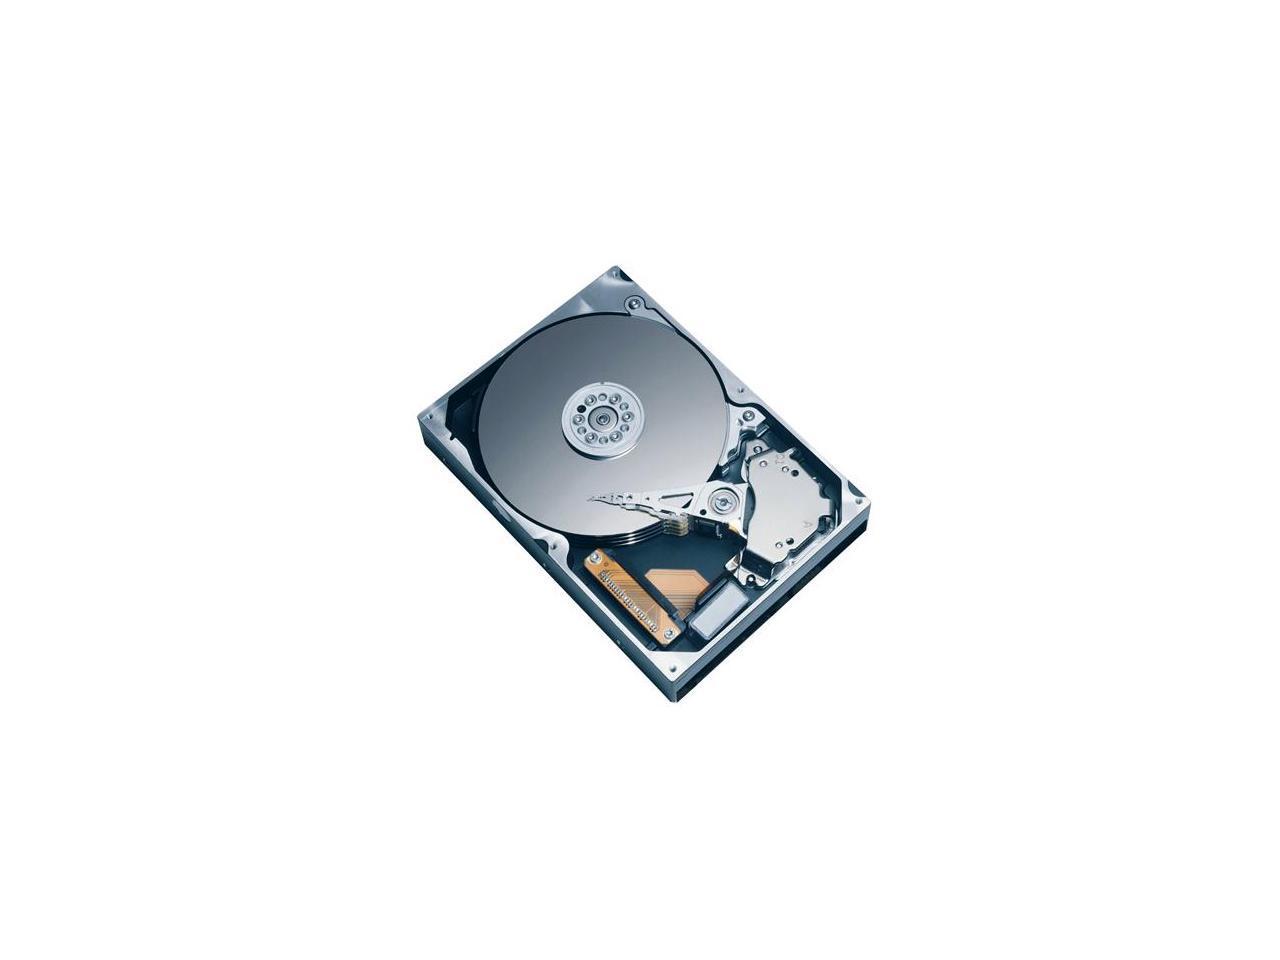 HardDrive 144450 Clutch Hub